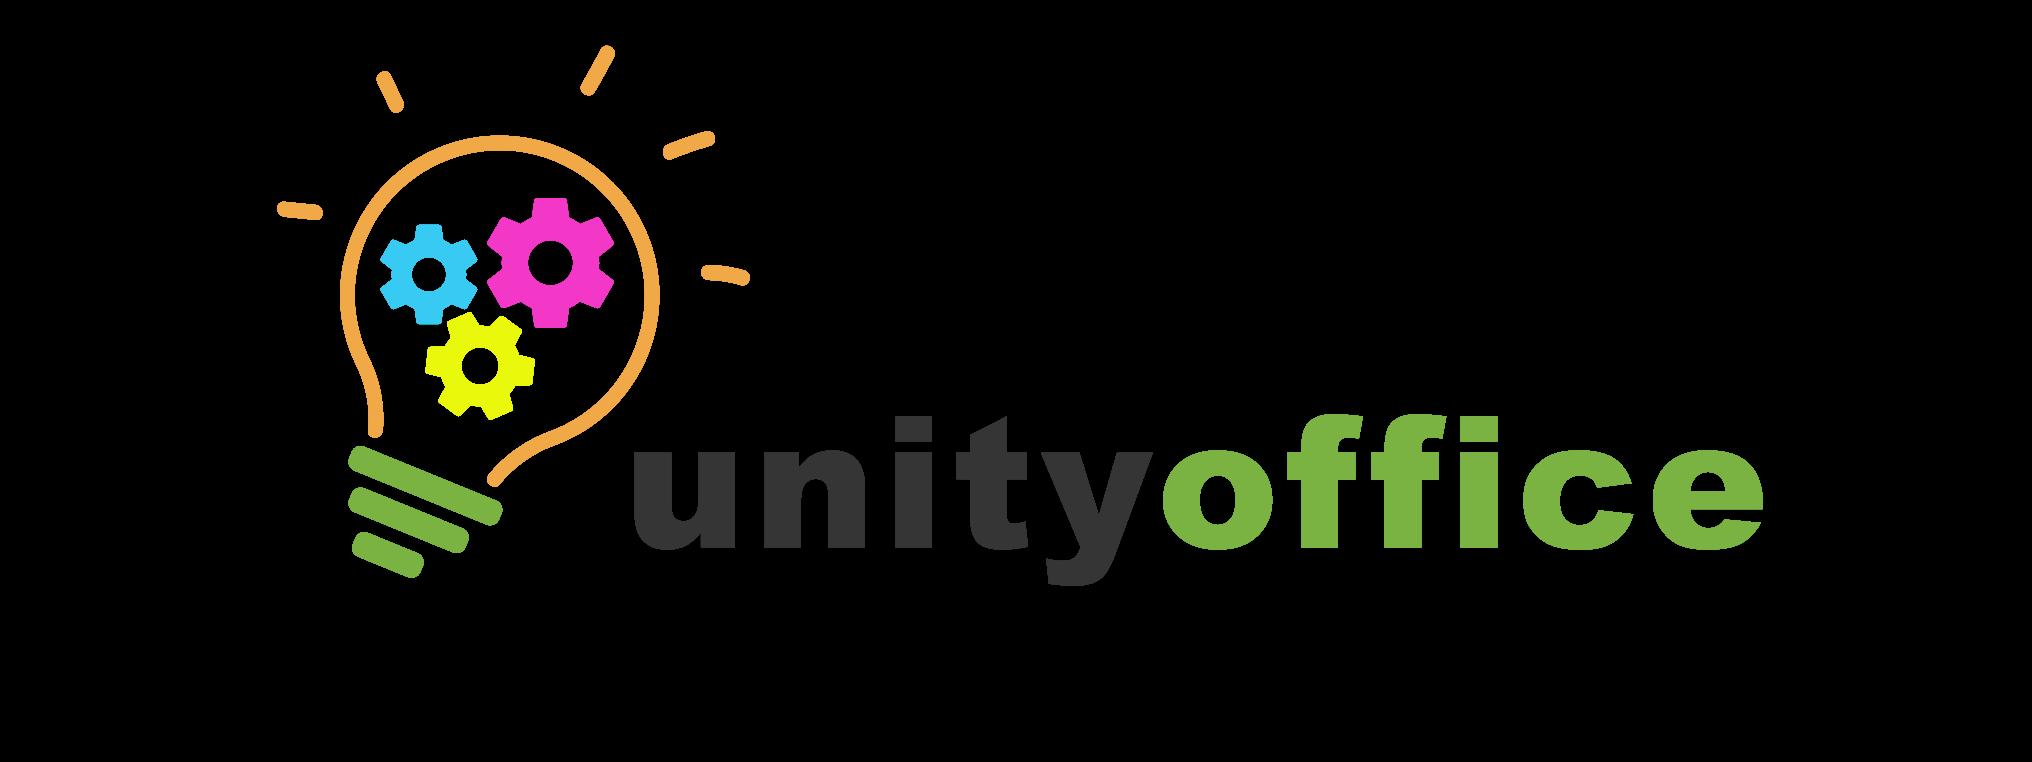 unityoffice_hi.png